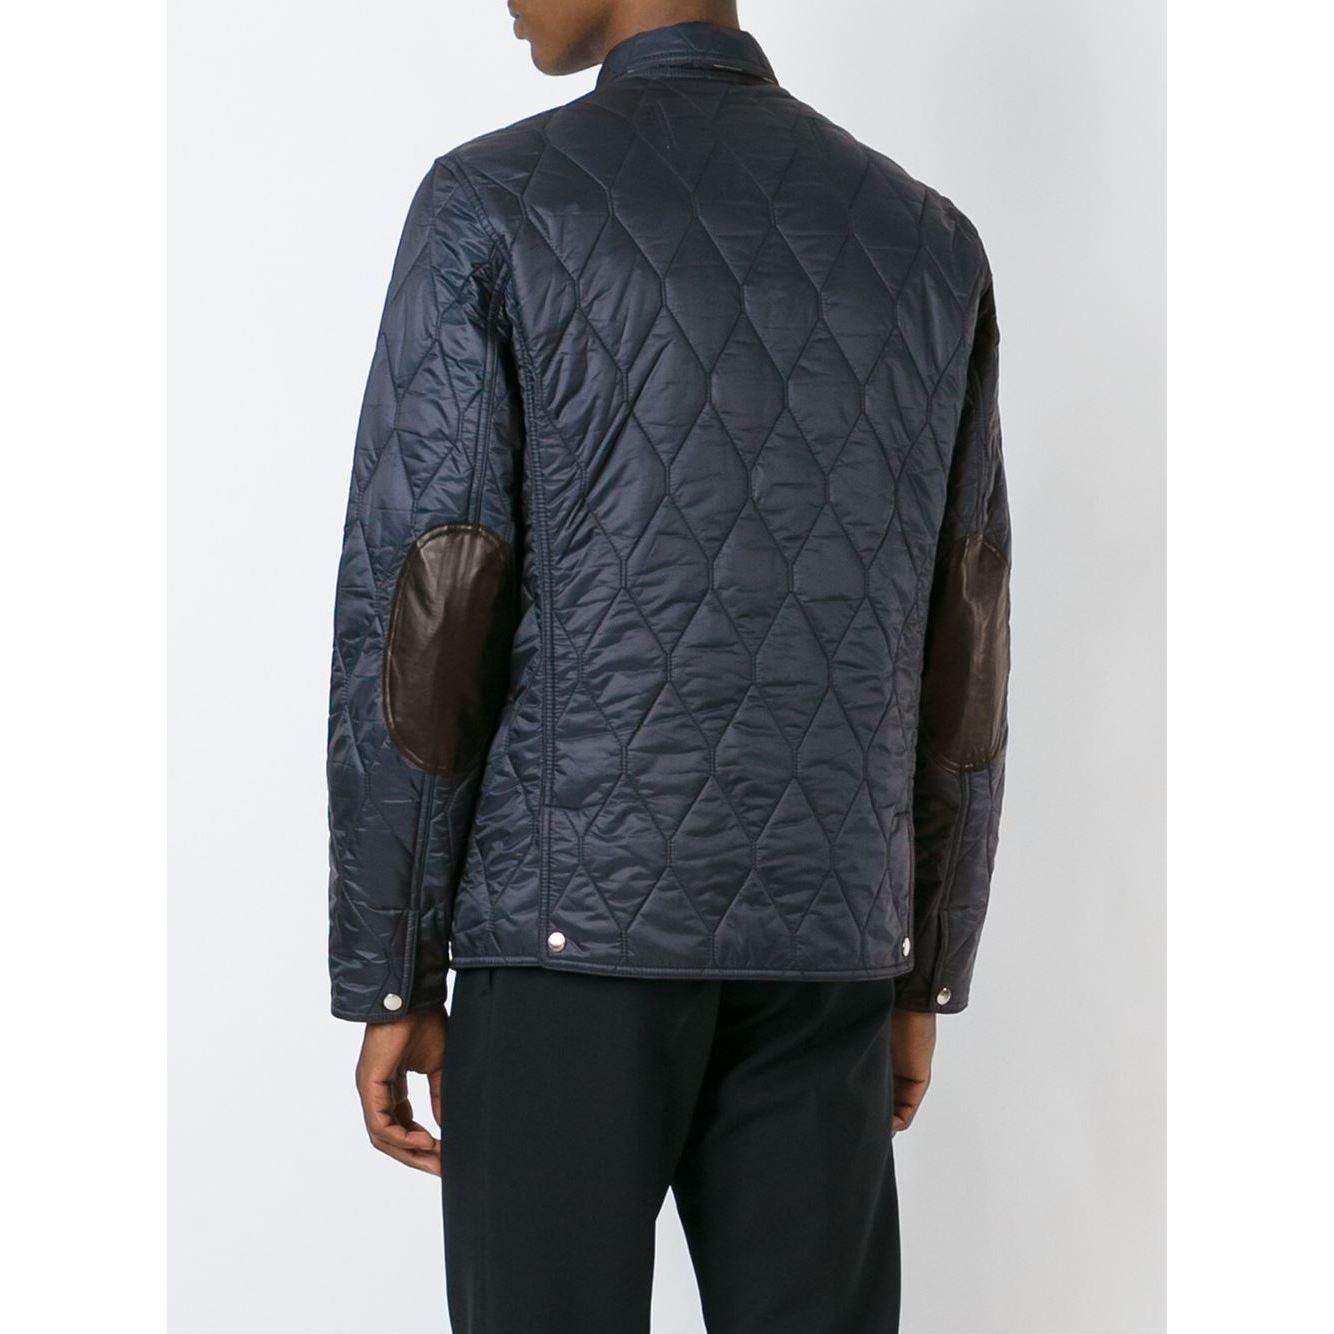 quilted jacket burberry leather aaron quilt mens s biker black paul men